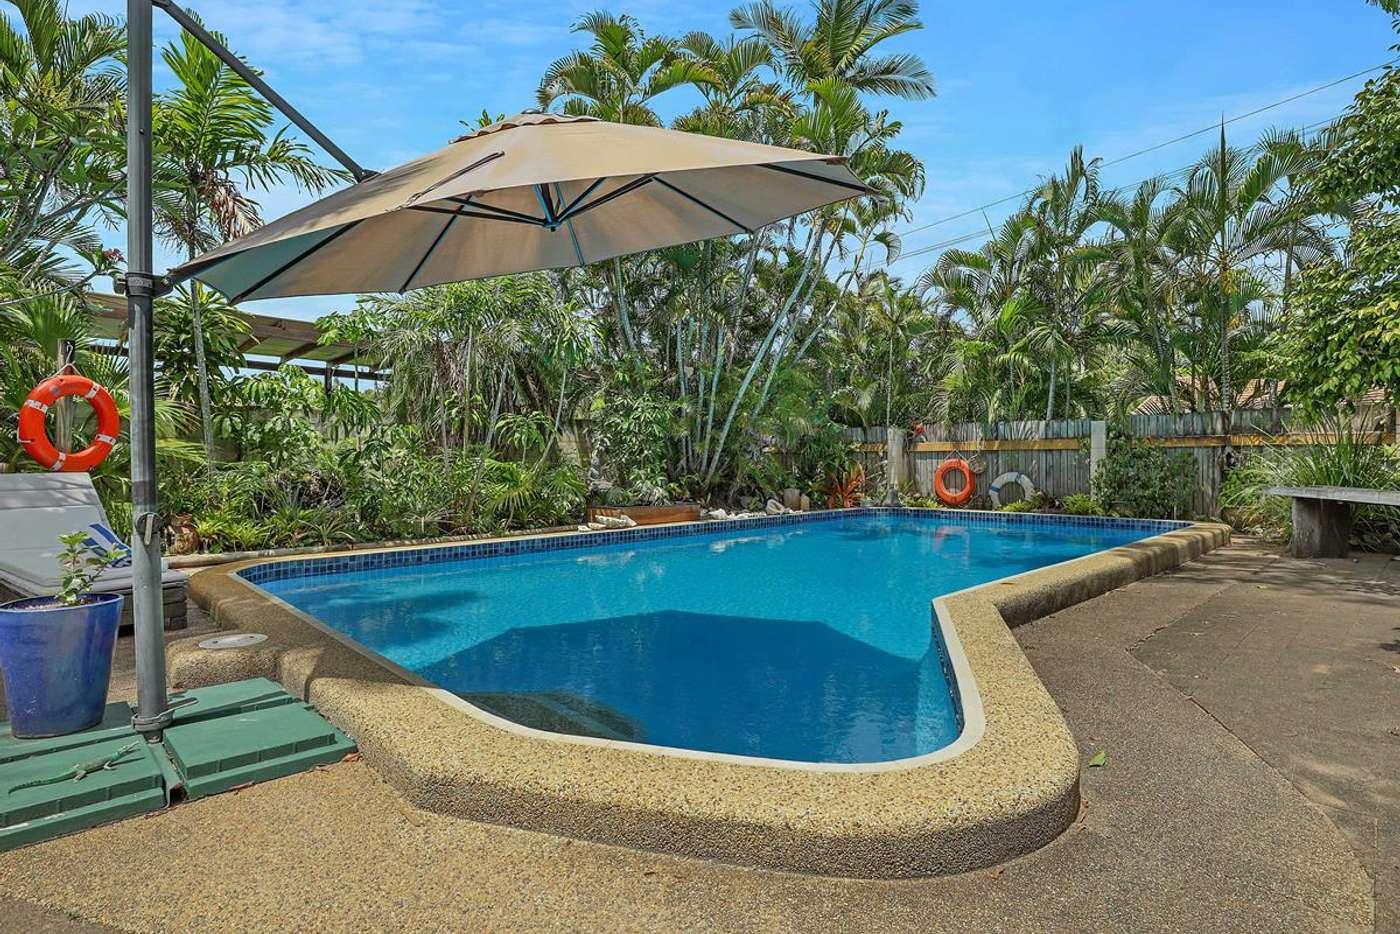 Main view of Homely house listing, 7 Tee street, Yorkeys Knob QLD 4878